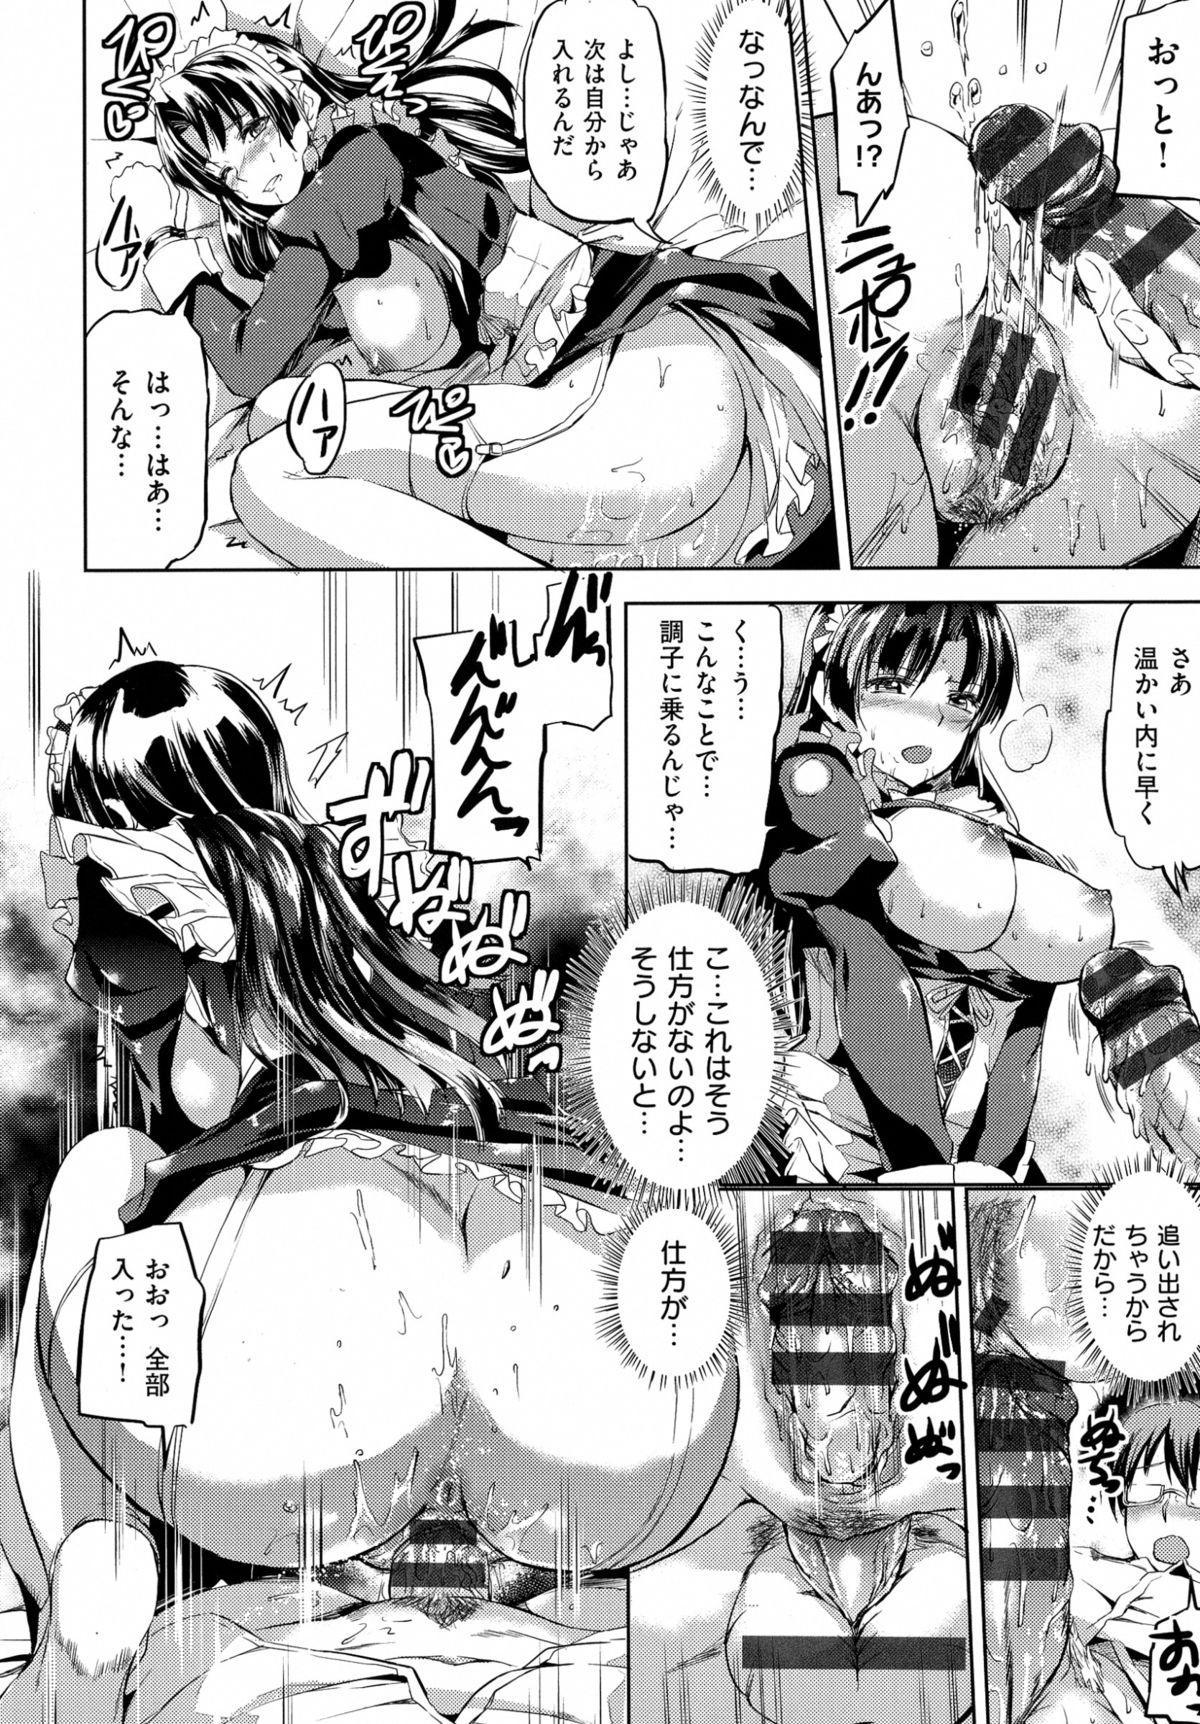 Ojousama no Maid Jijou 119